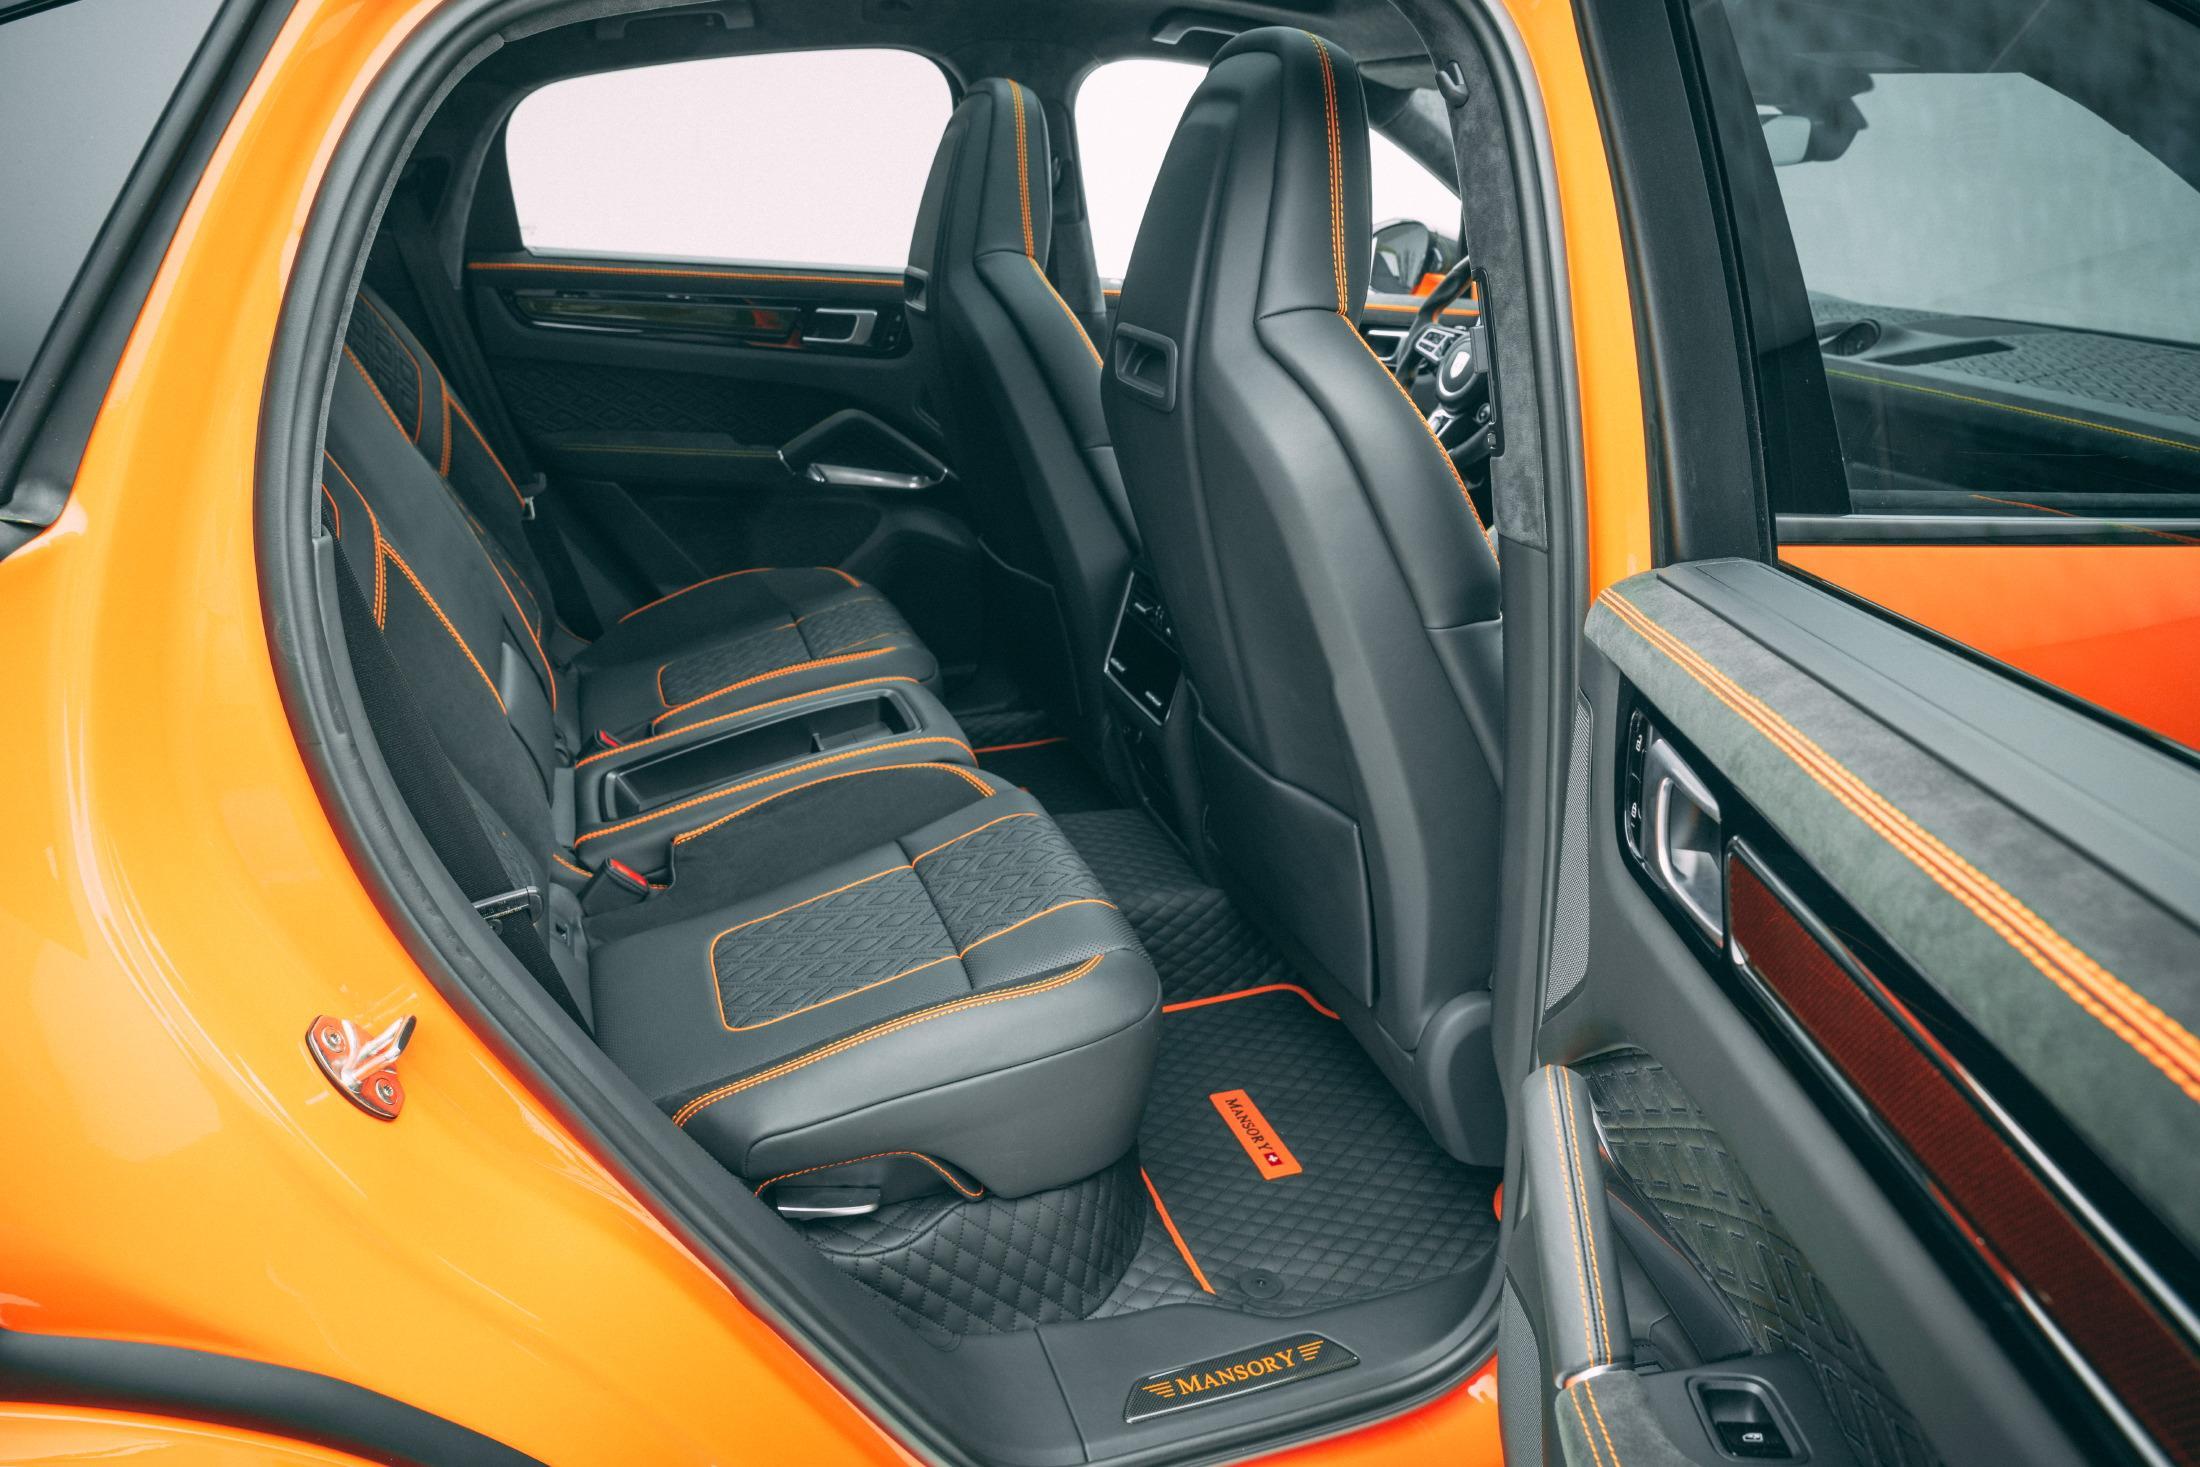 Mansory Porsche Cayenne Turbo Coupe Rear Seats